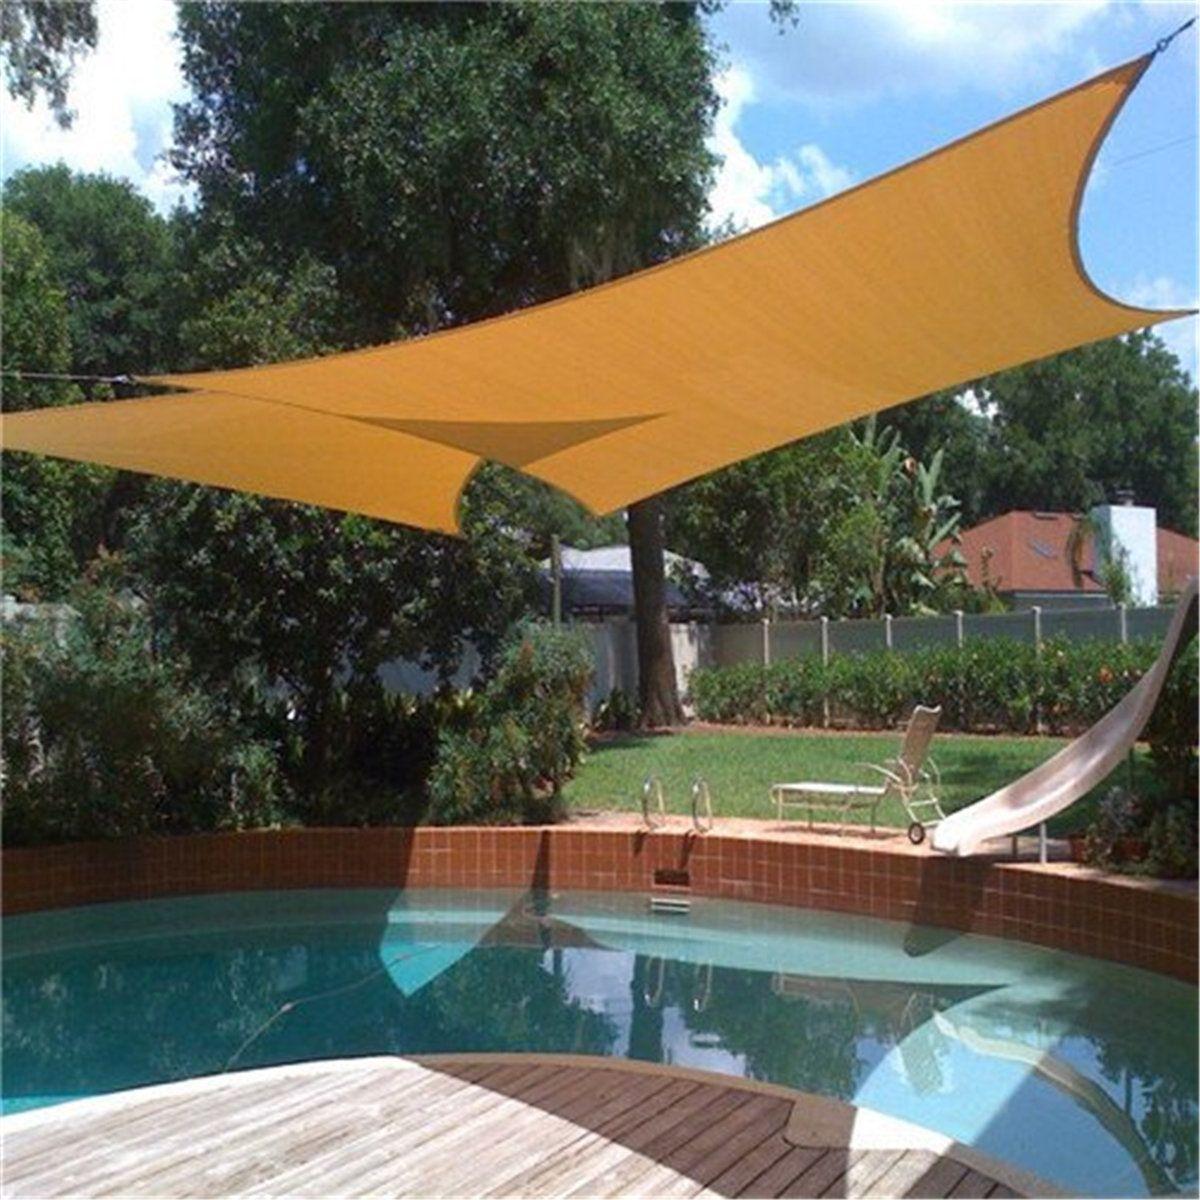 2x1 8m Sun Sailing Shade Mesh Net Garden Plants Covered Awning Waterproof Canopy Anti Uv Sun Shelter Pool Shade Shade Sails Patio Patio